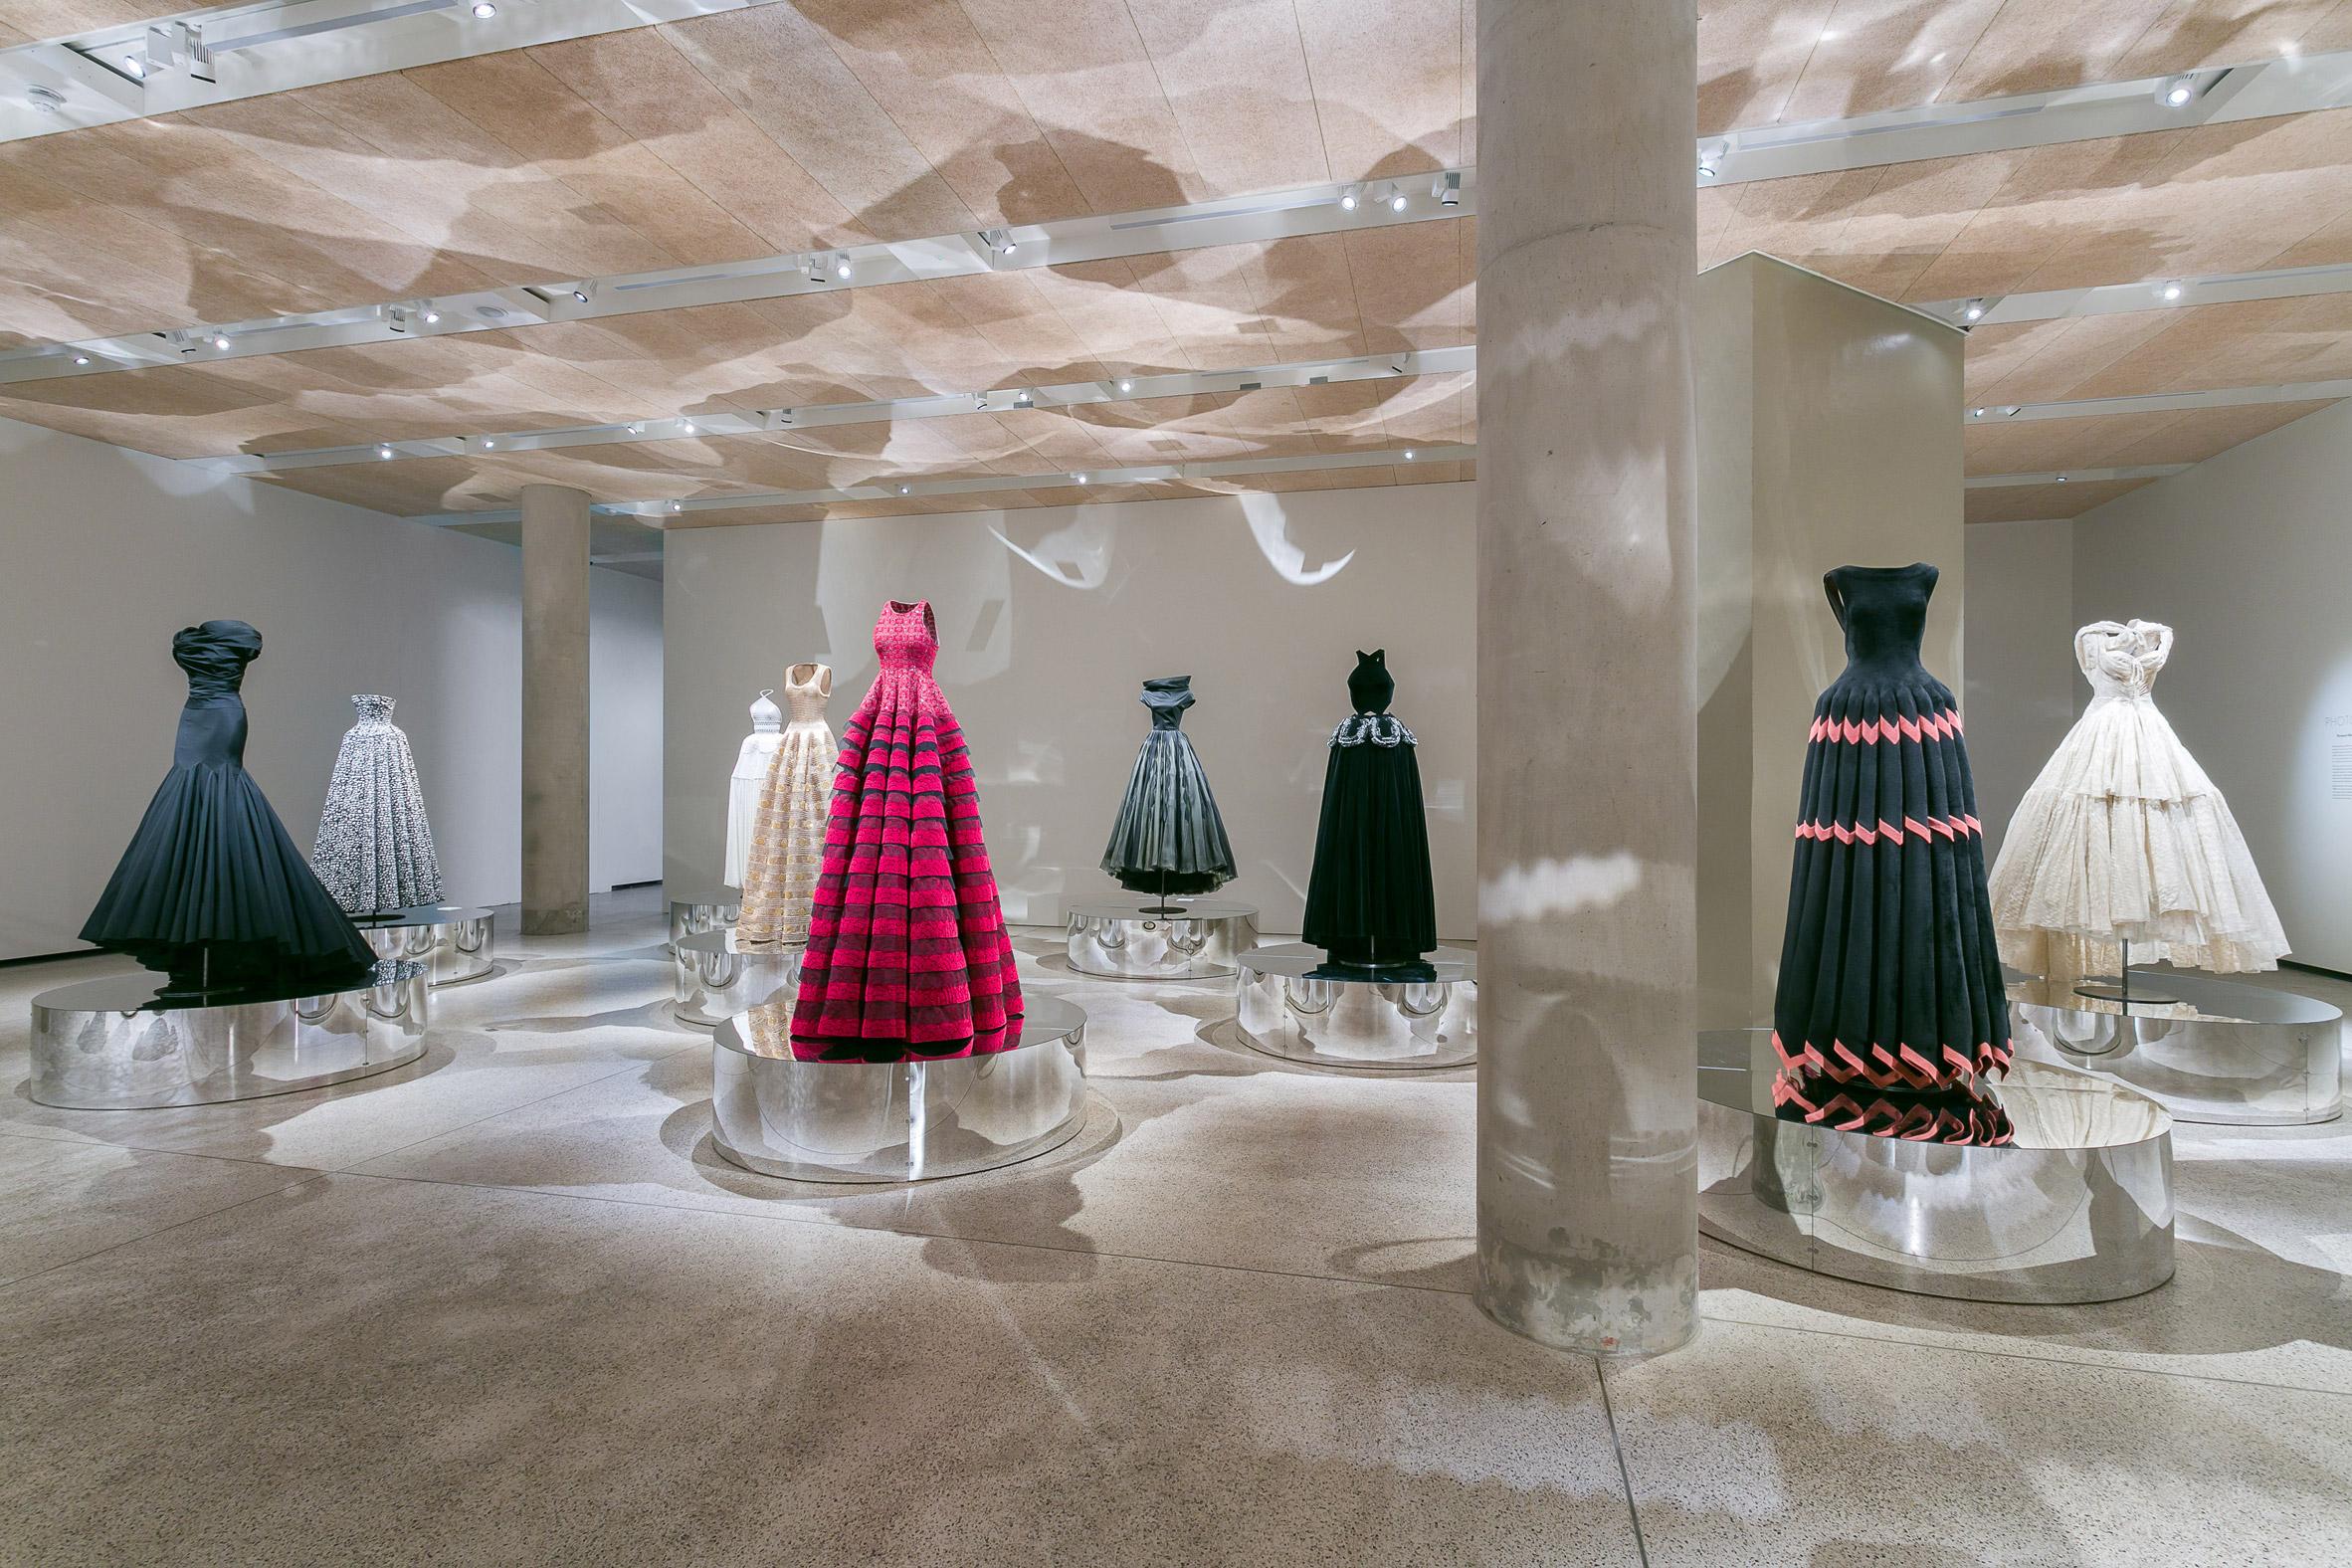 azzedine-alaia-fashion-exhibition-design_dezeen_2364_col_6.jpg